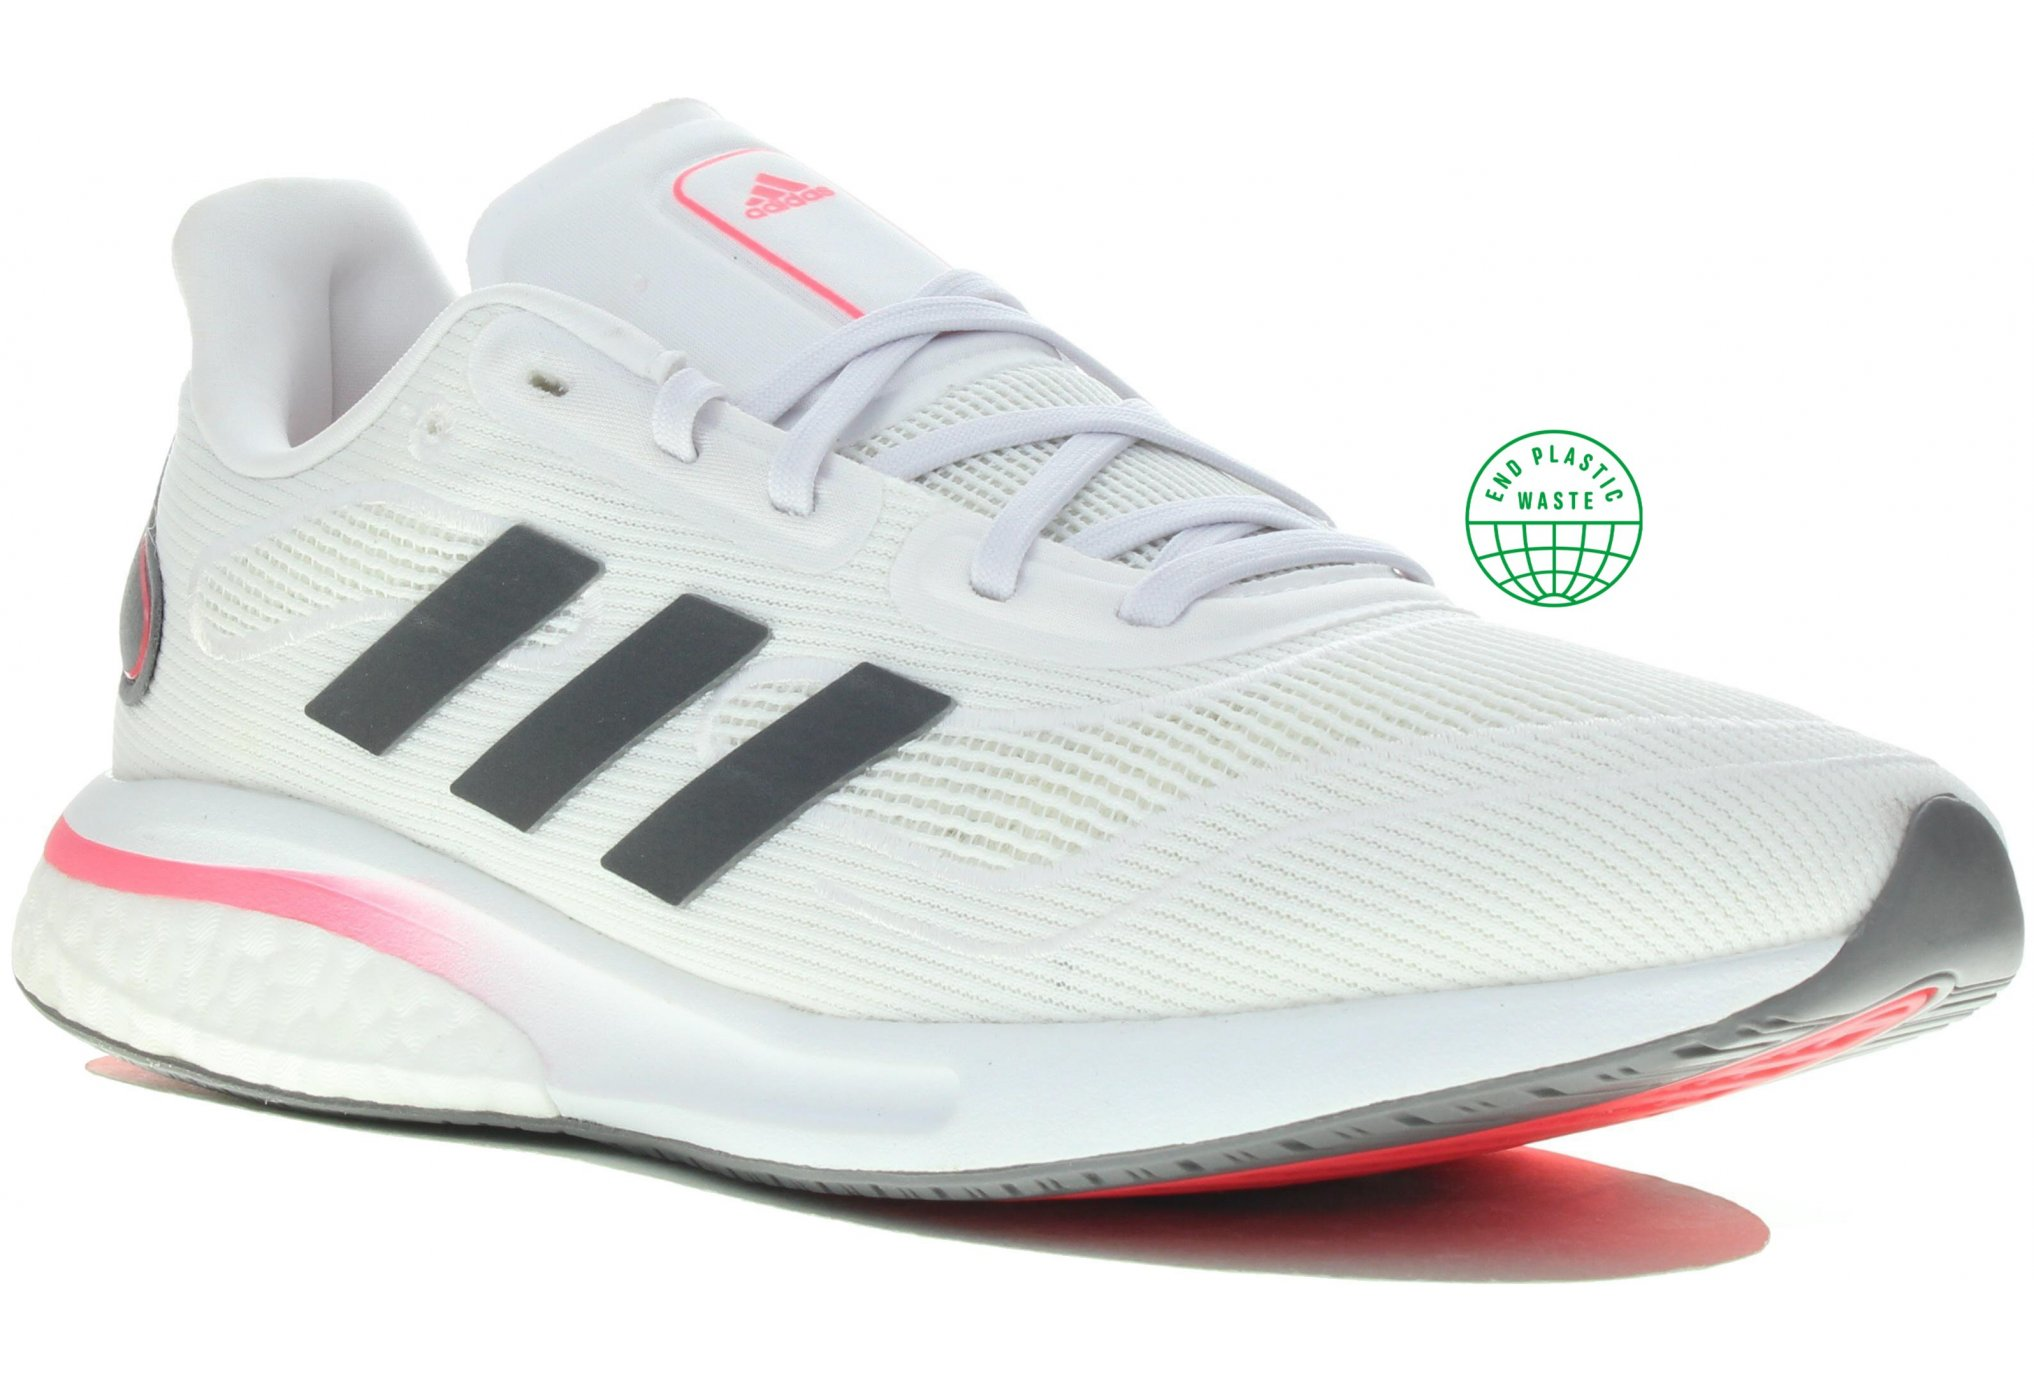 adidas Supernova Primegreen W Chaussures running femme